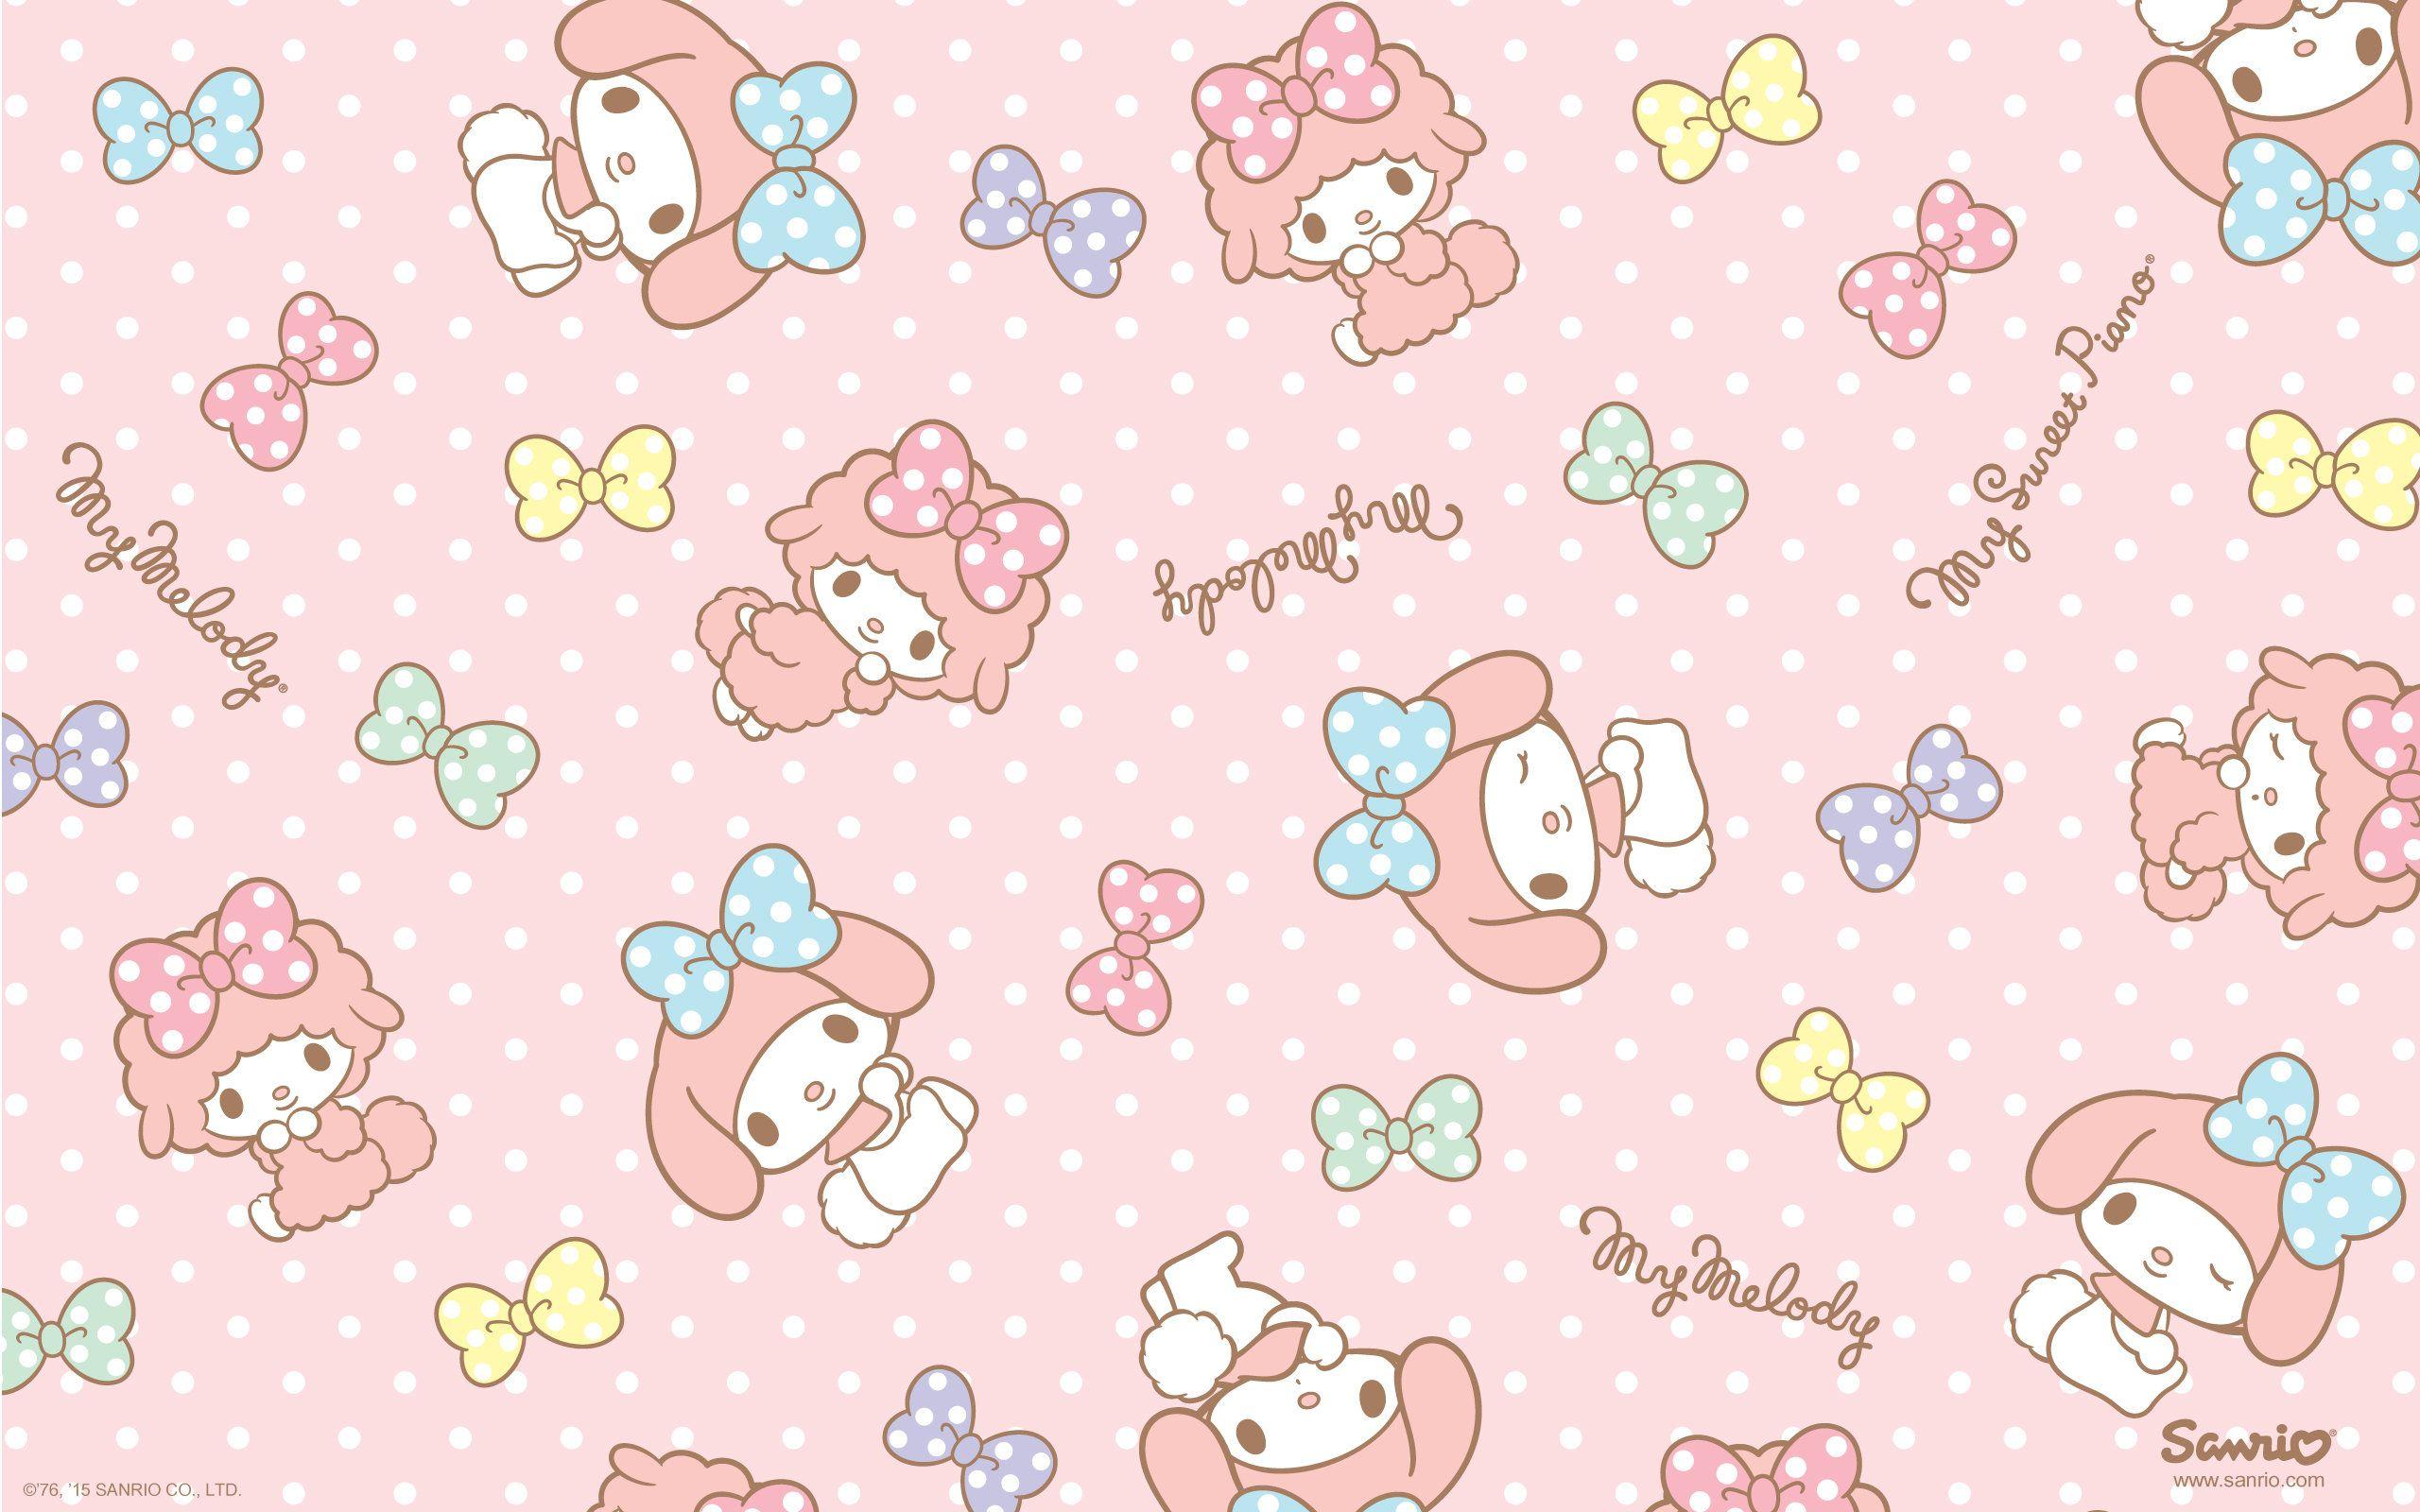 Sanrio iPhone Wallpapers on WallpaperDog